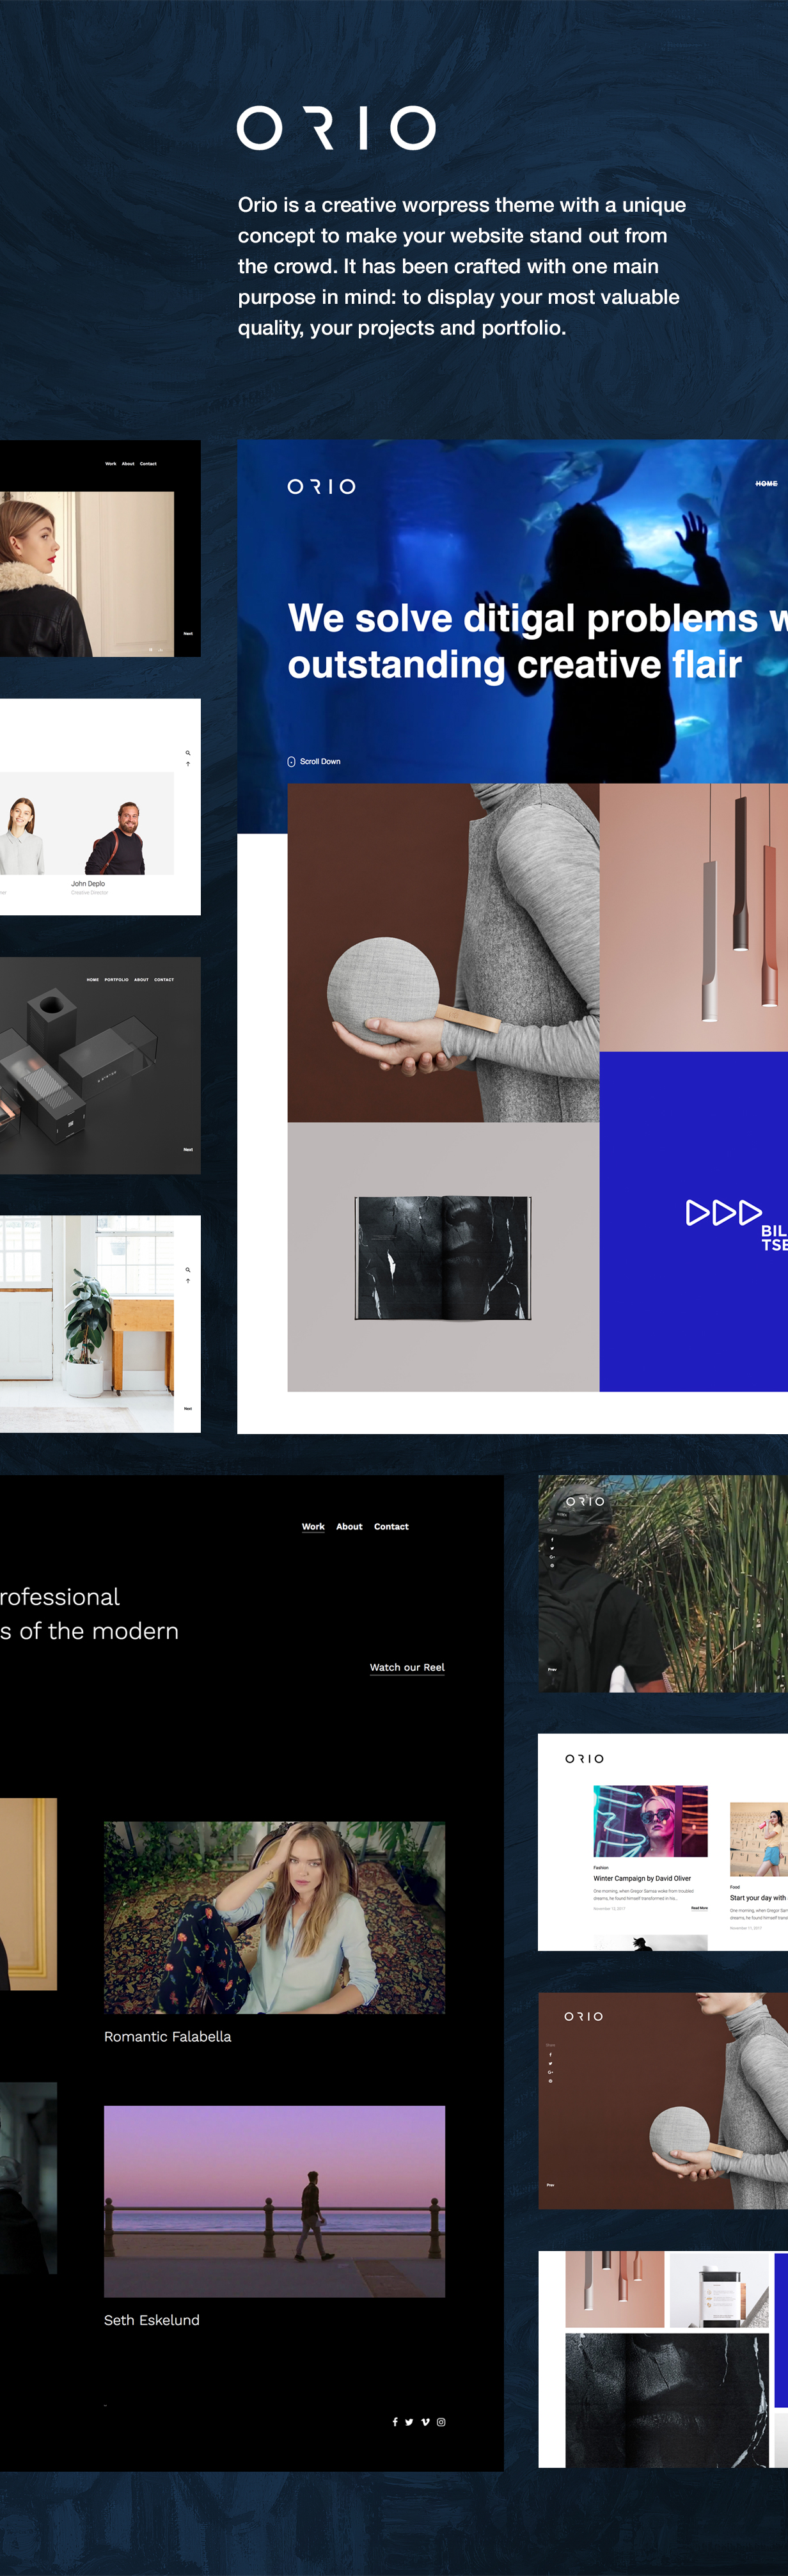 Orio - A creative Portfolio & Agency Theme - 4